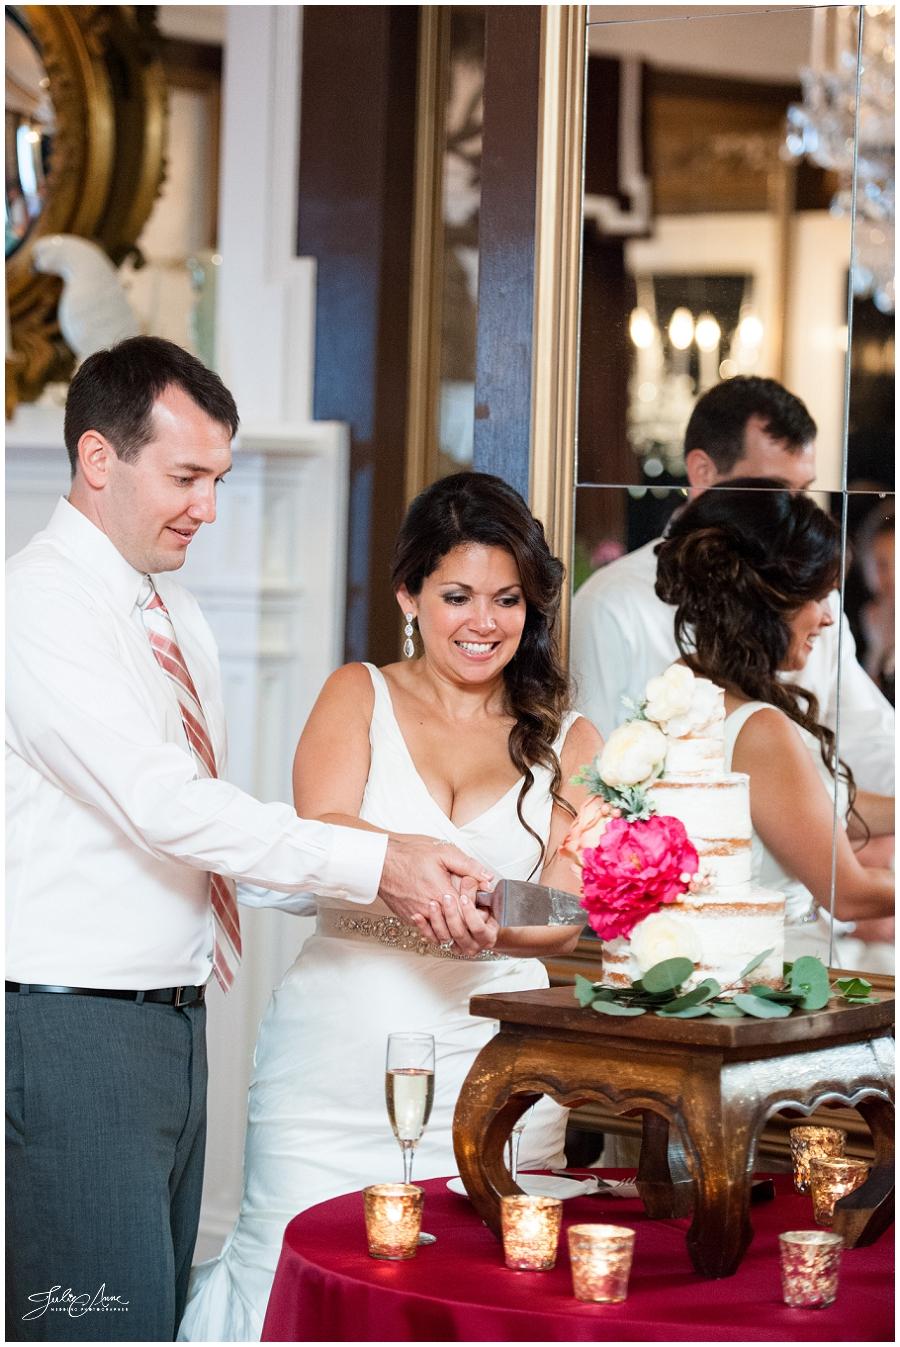 naked_wedding_cake_olde_pink_house_savannah_Wedding_not_a_crumb_julie_anne_photography (8).jpg